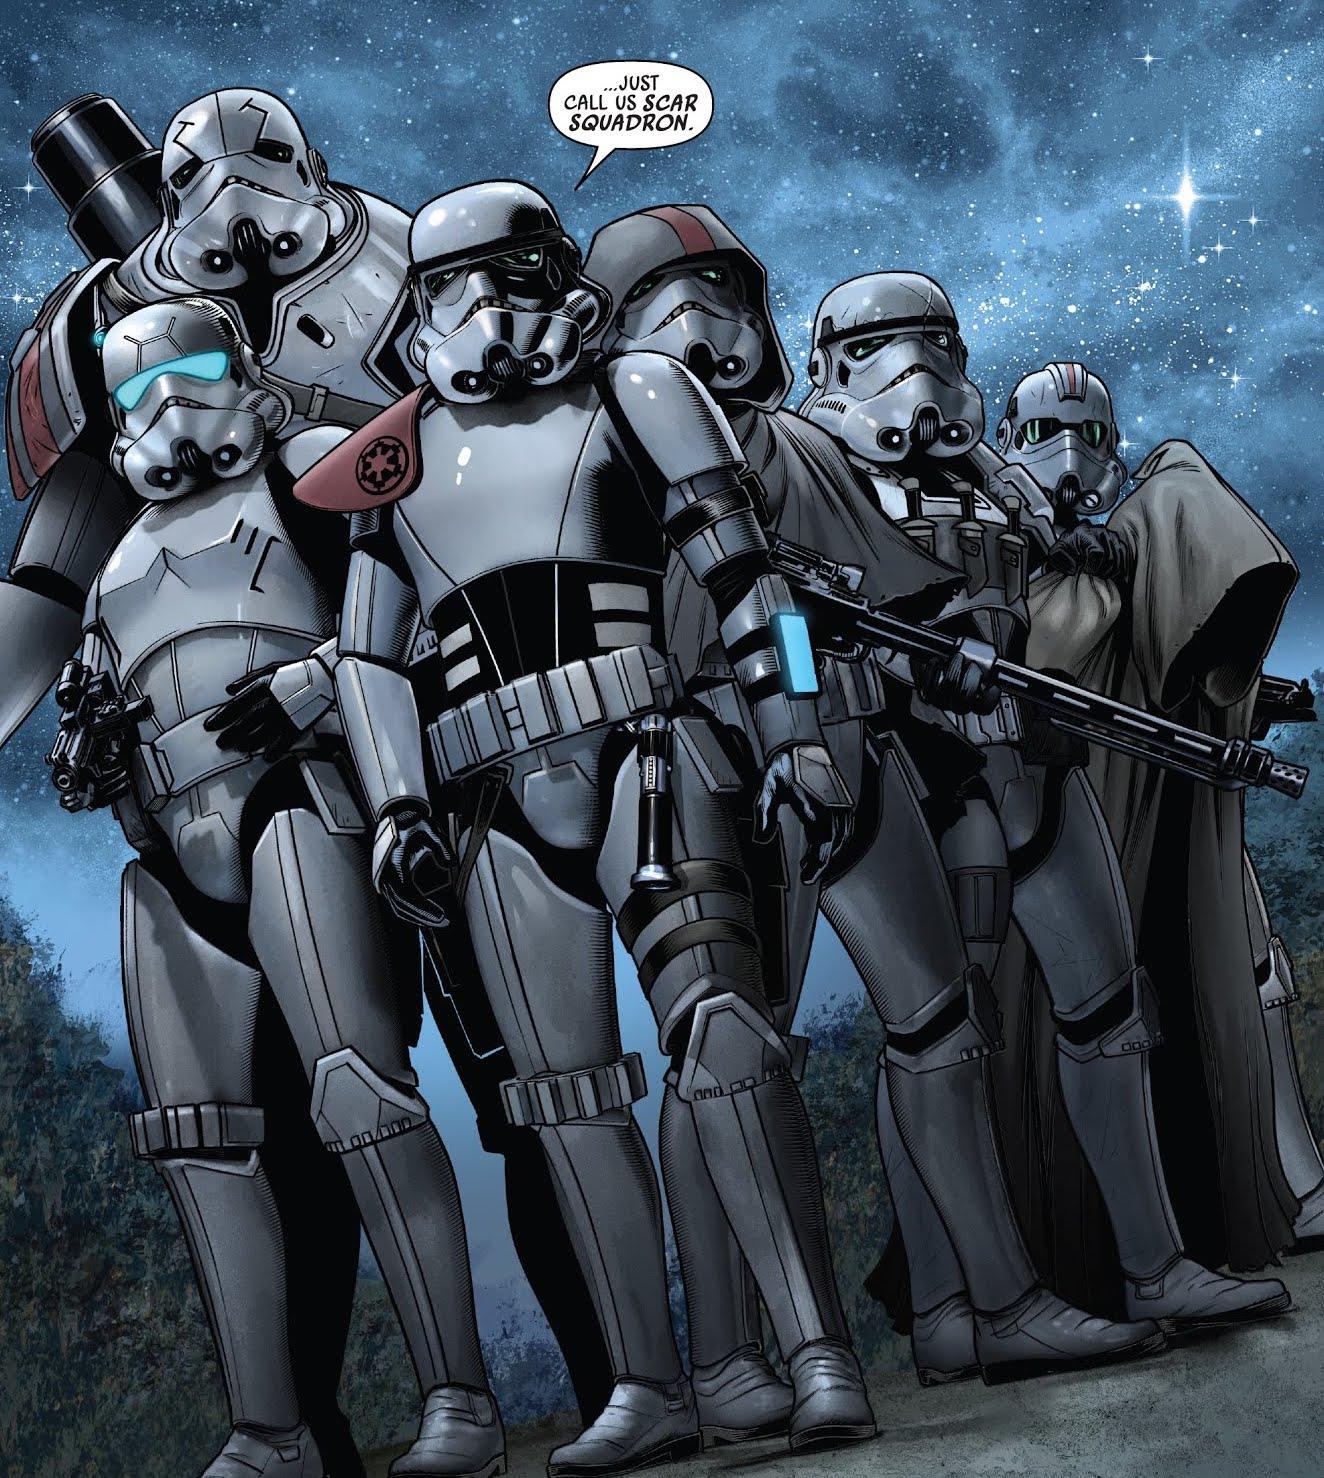 Special Commando Advanced Recon trooper | Wookieepedia | FANDOM